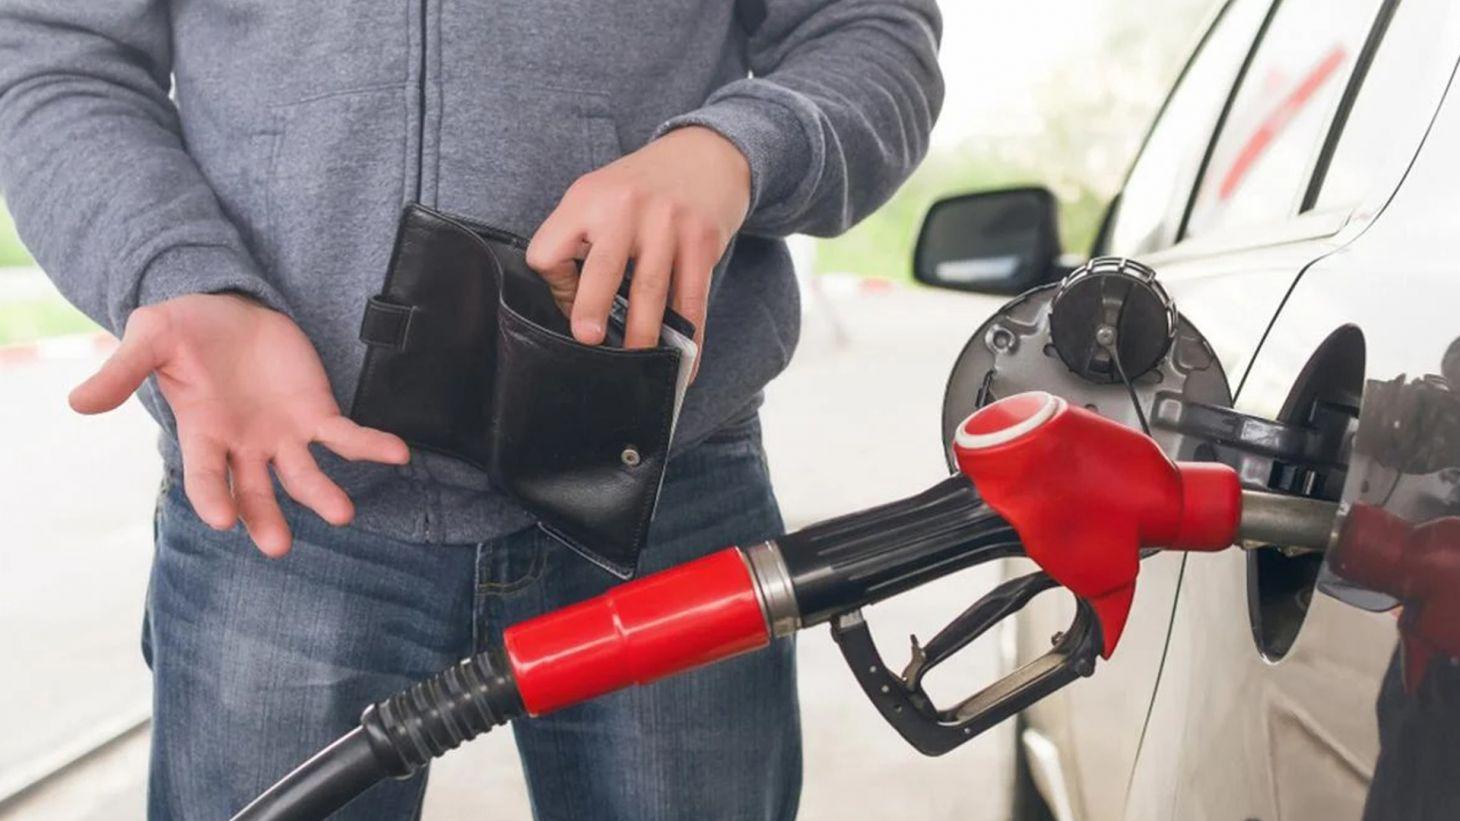 motorista do carro flex calculando consumo carteira na mao